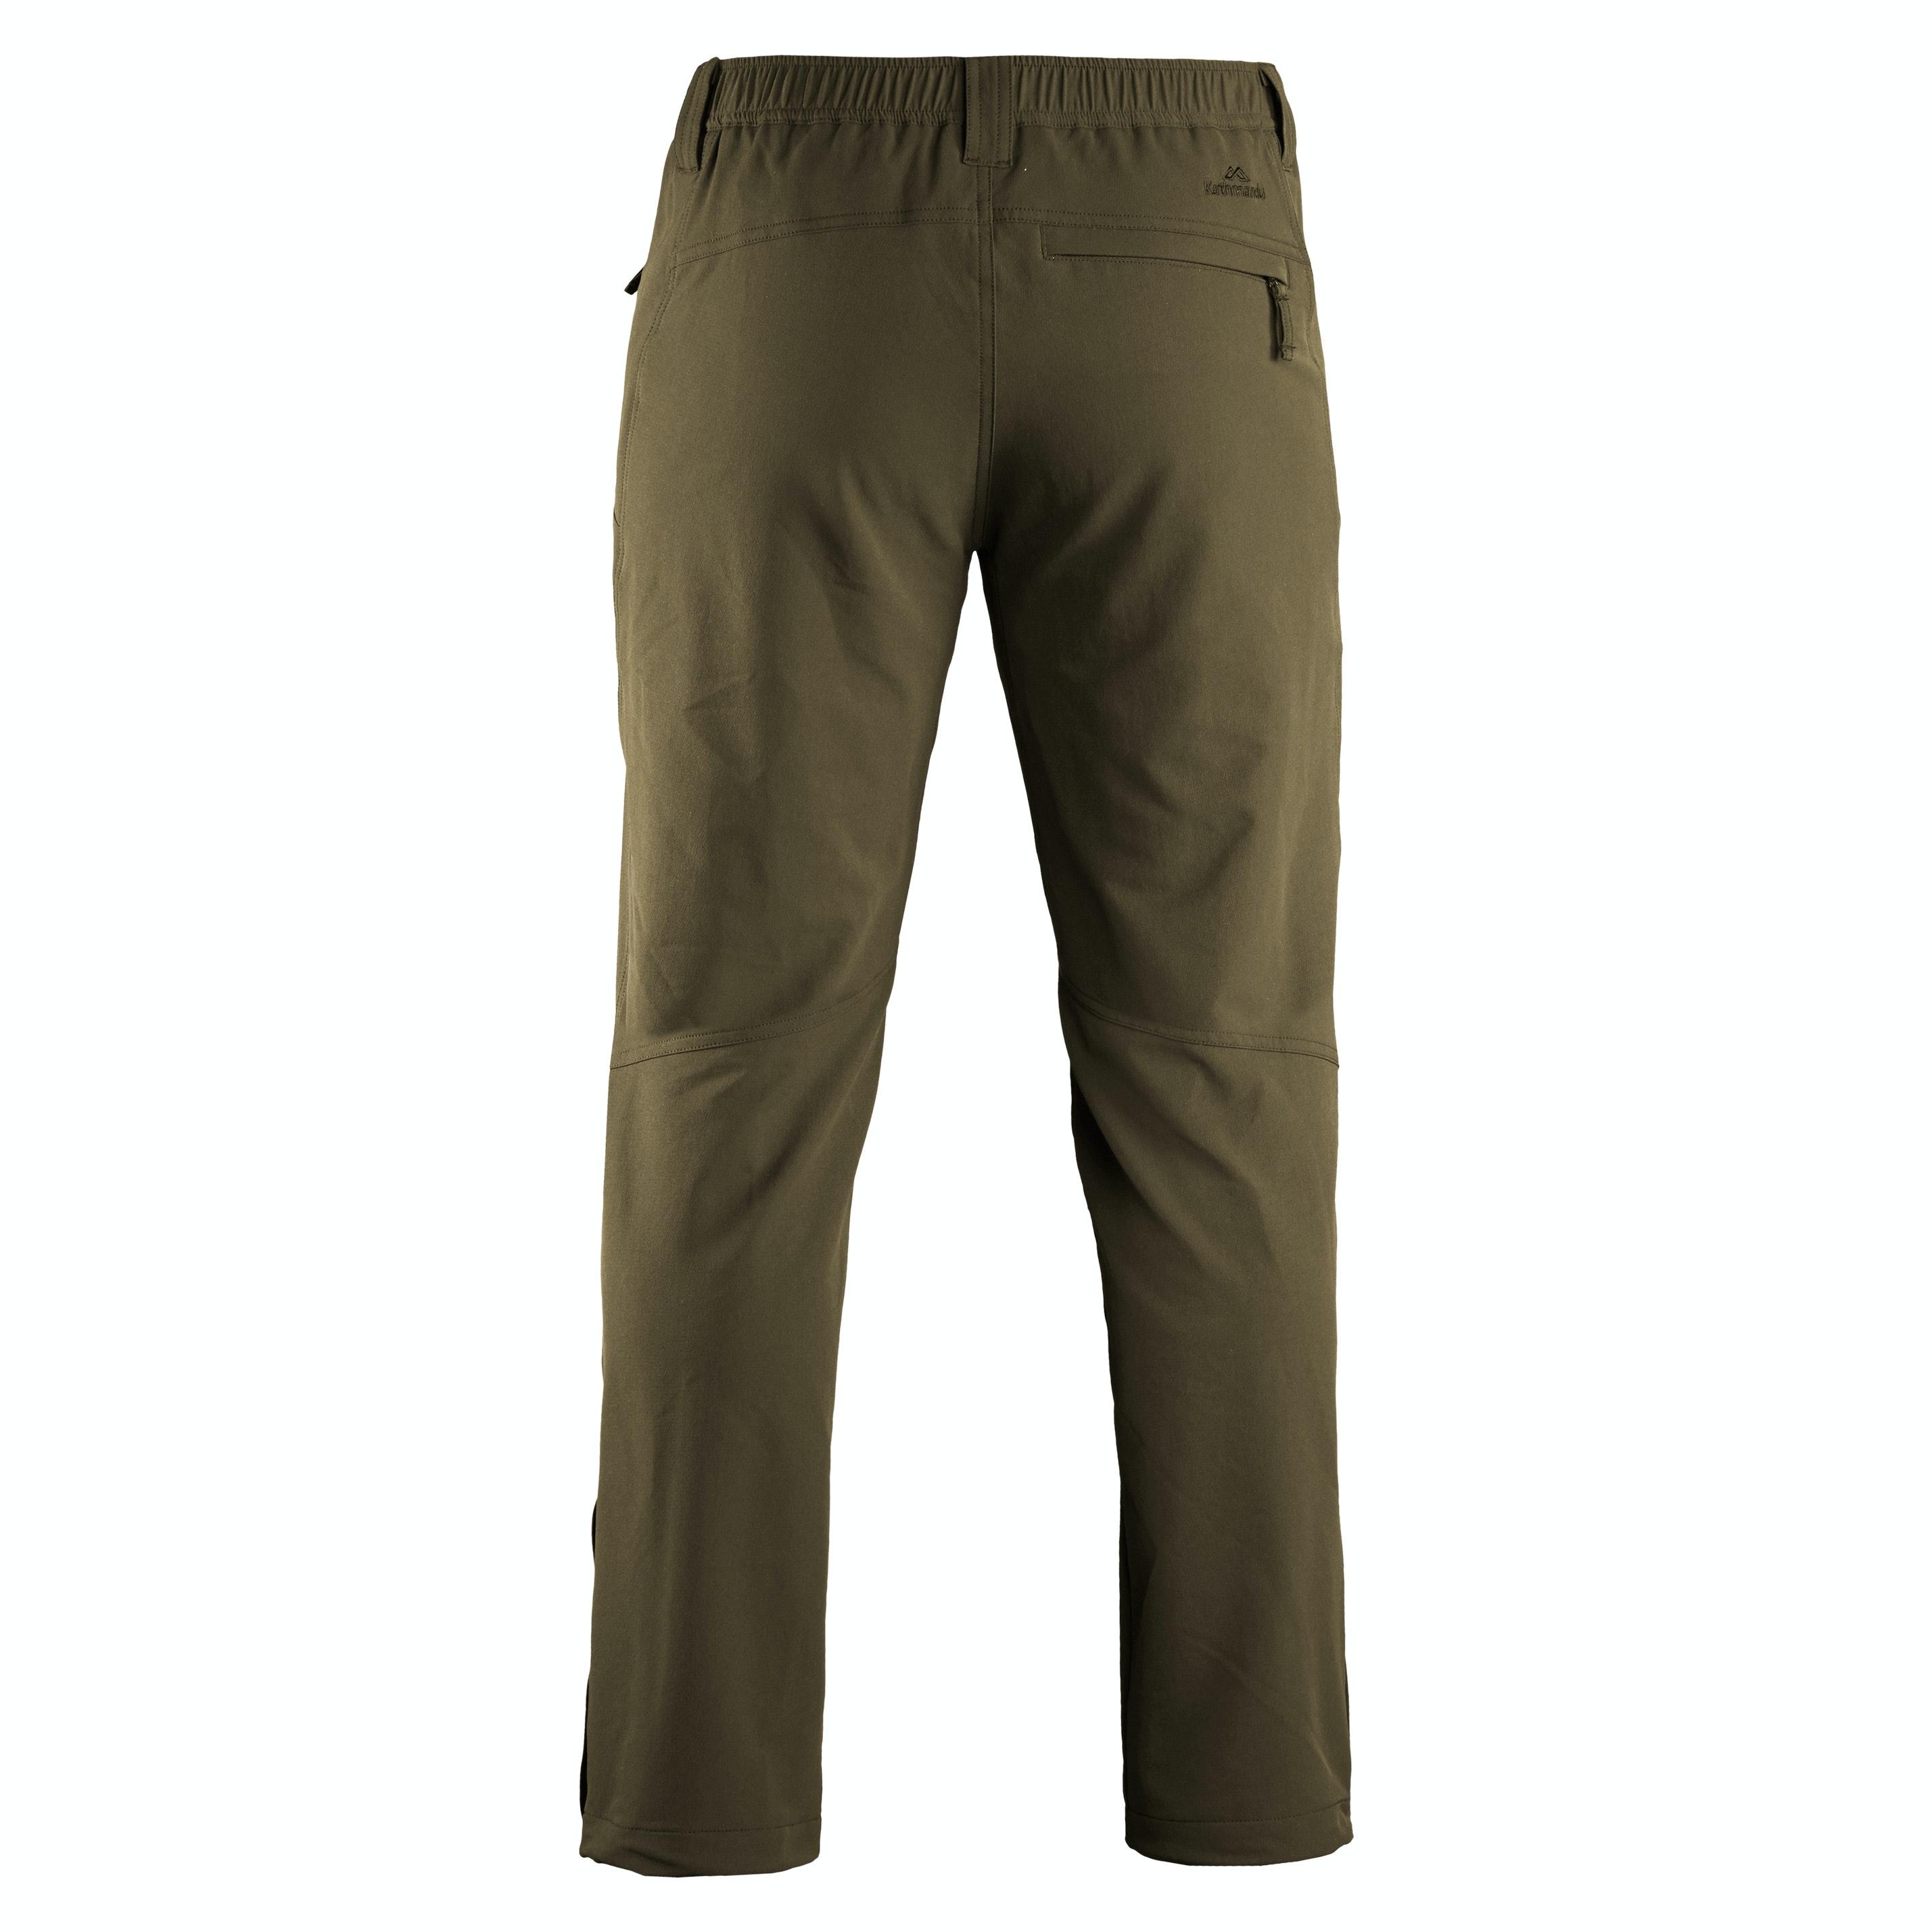 Kathmandu Tupelo Mens Softshell Hiking Pants Trousers v2 ...